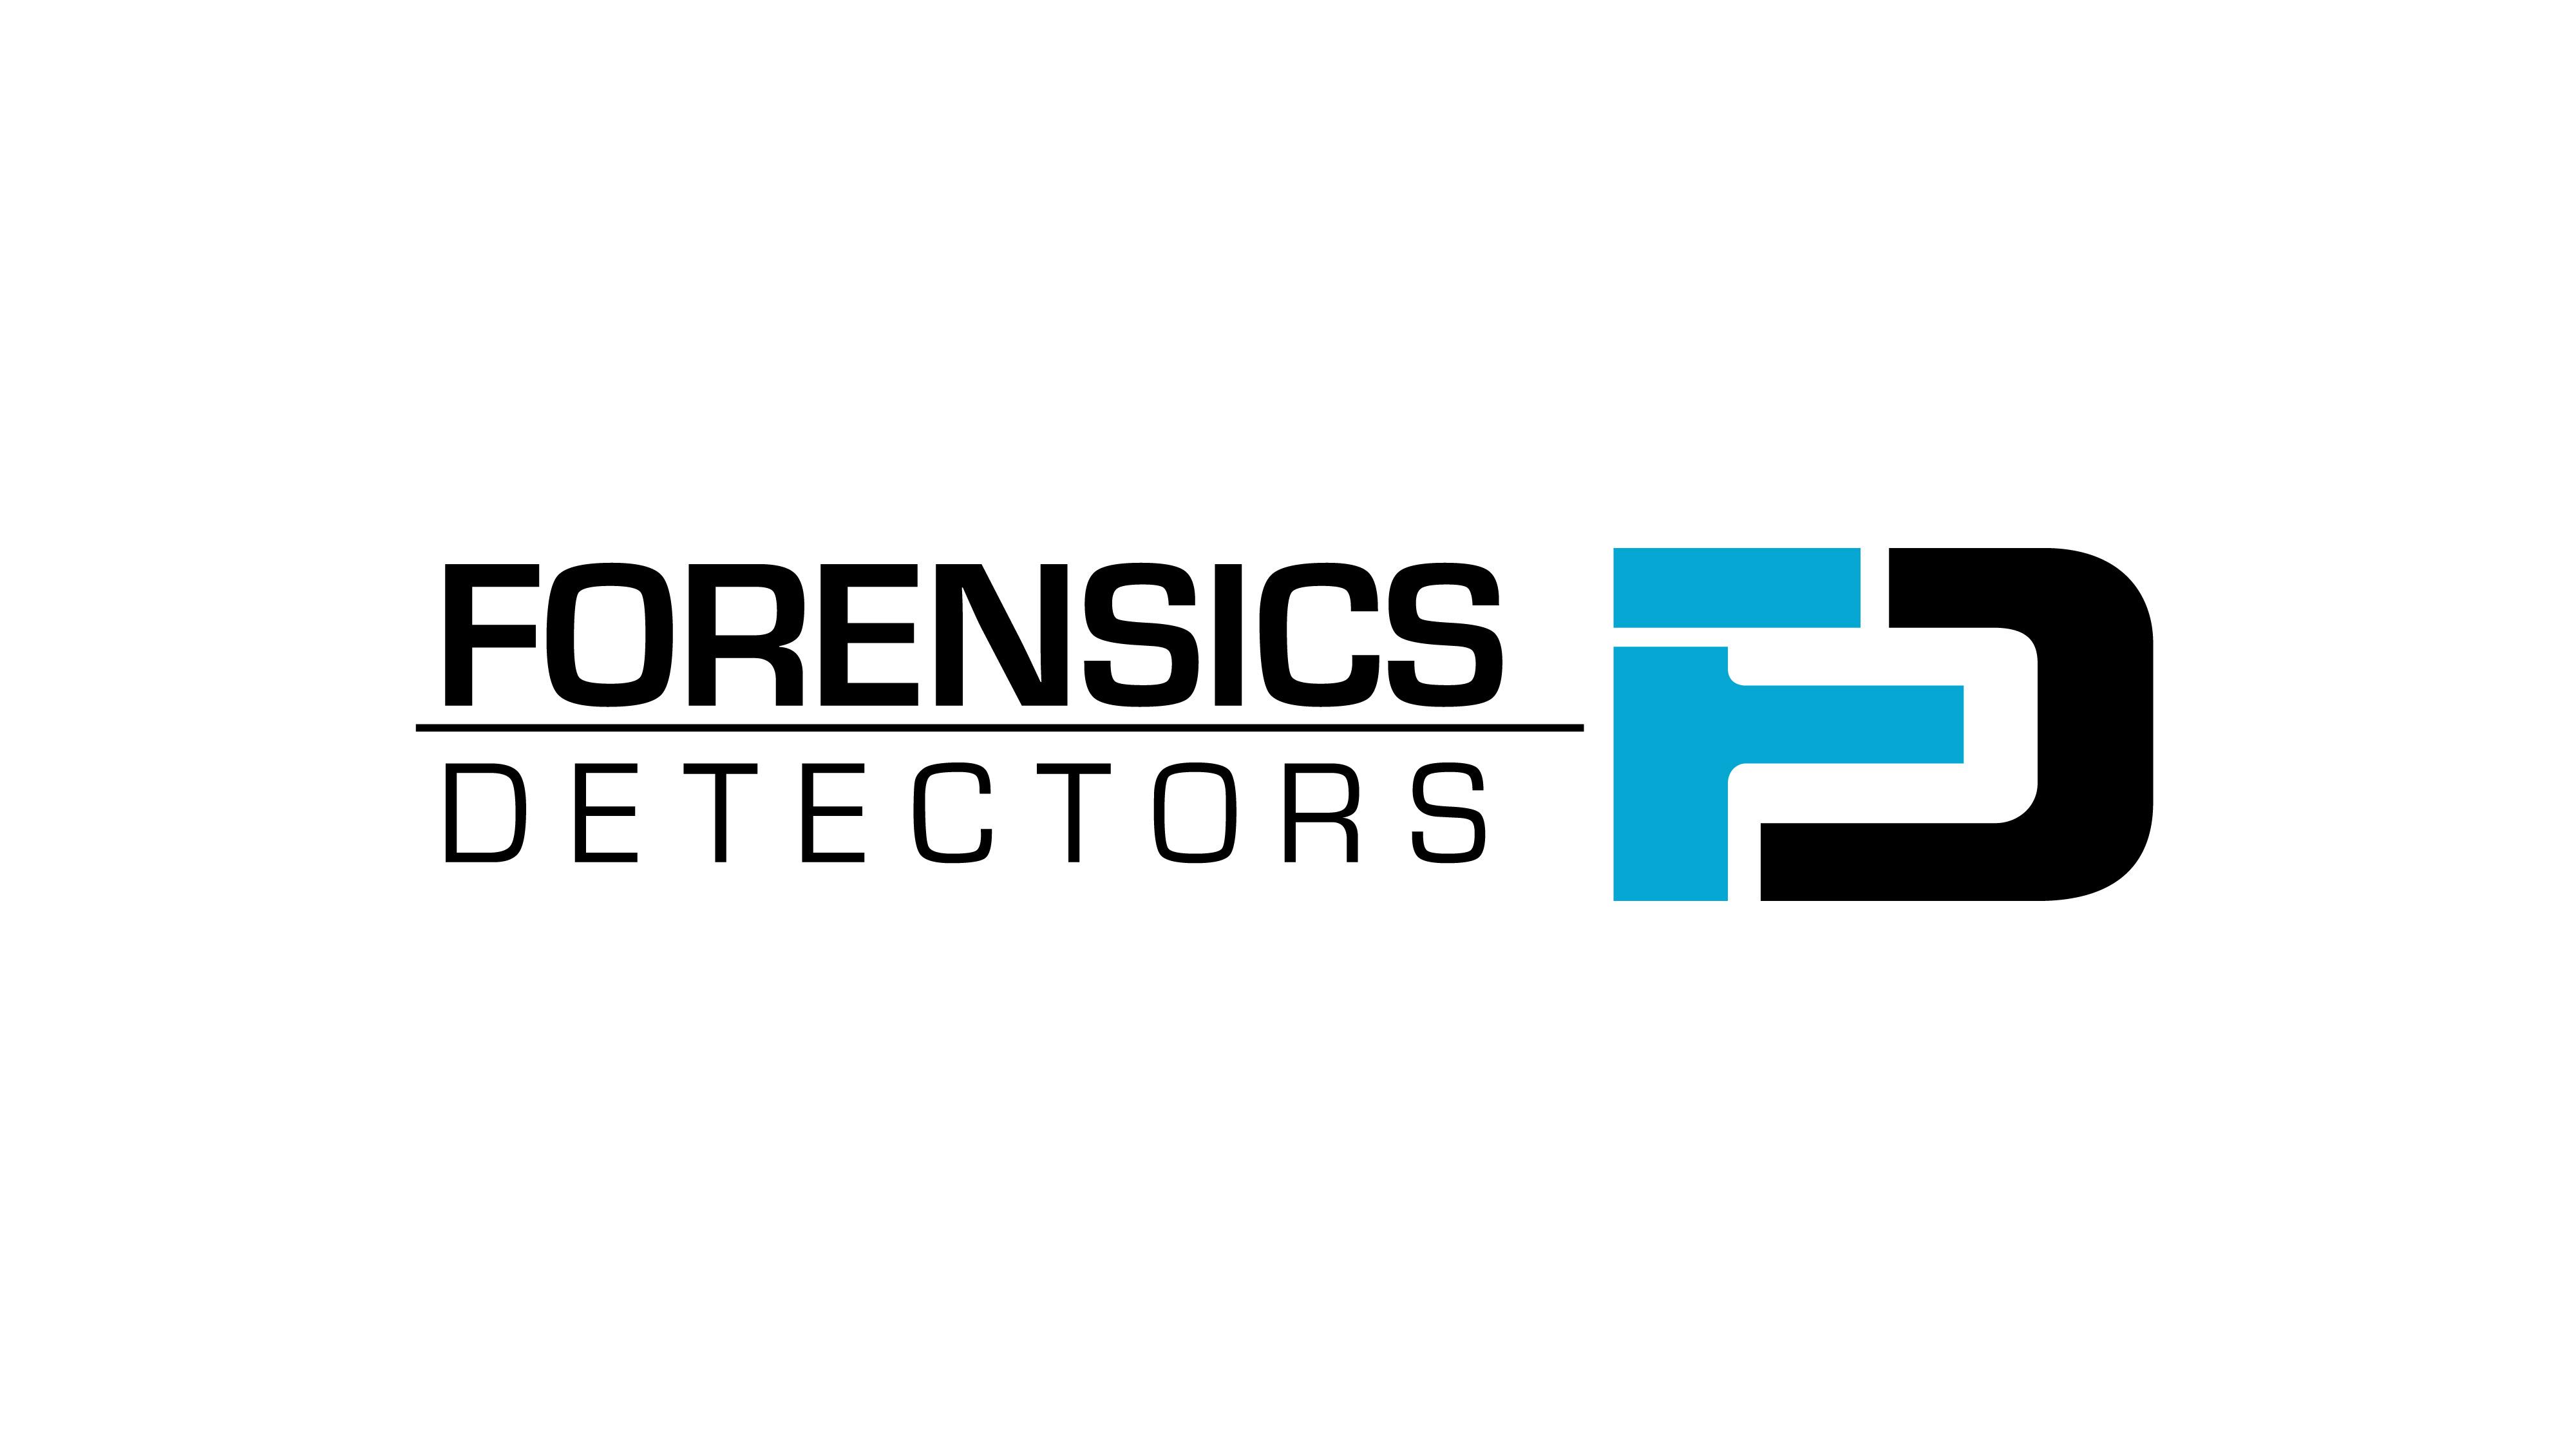 FORENSICS DETECTORS